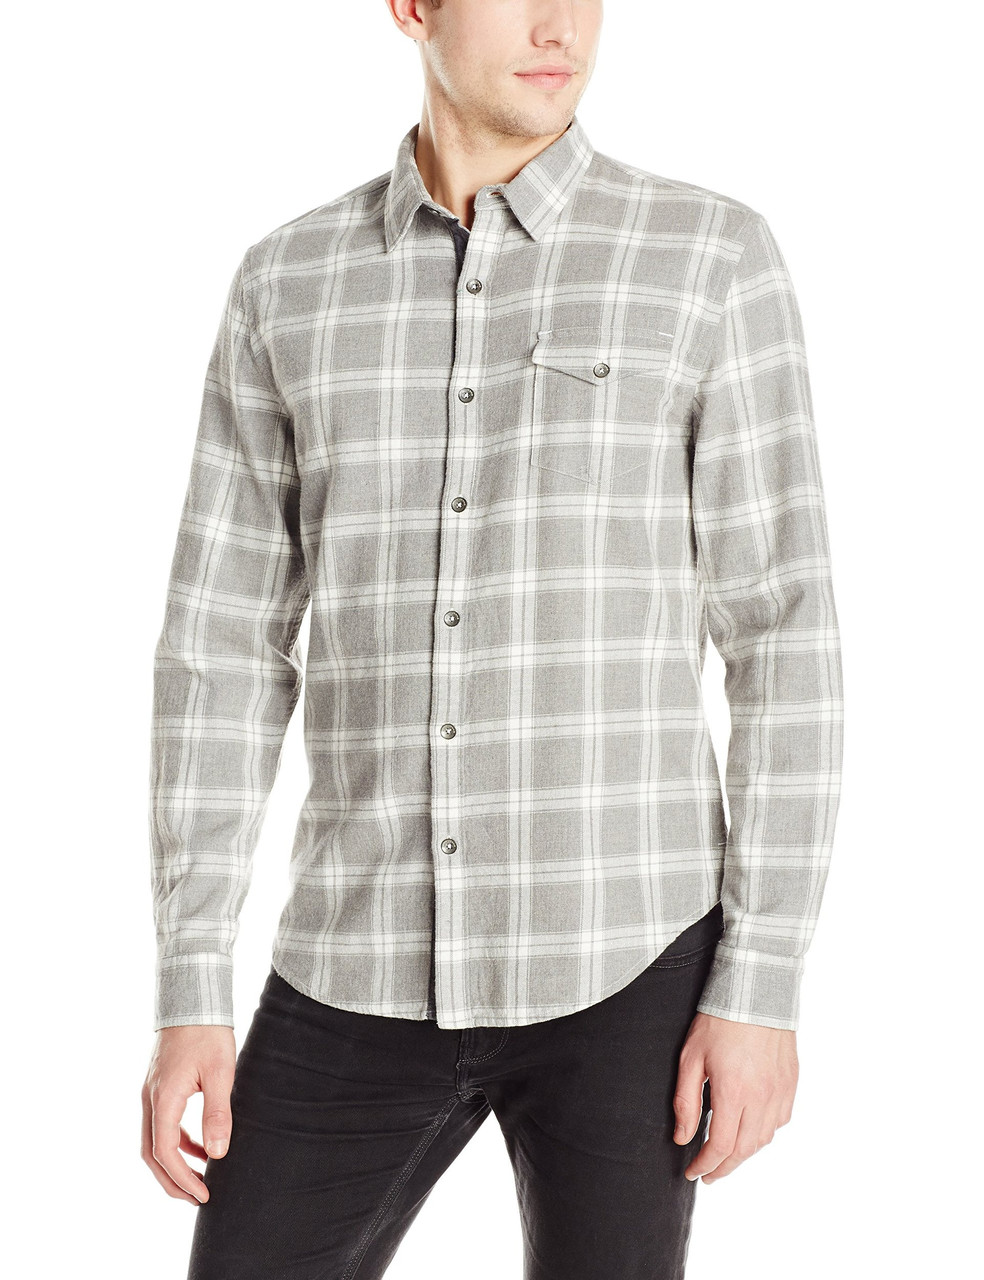 Рубашка DKNY, XL, Heather Grey, M4570021